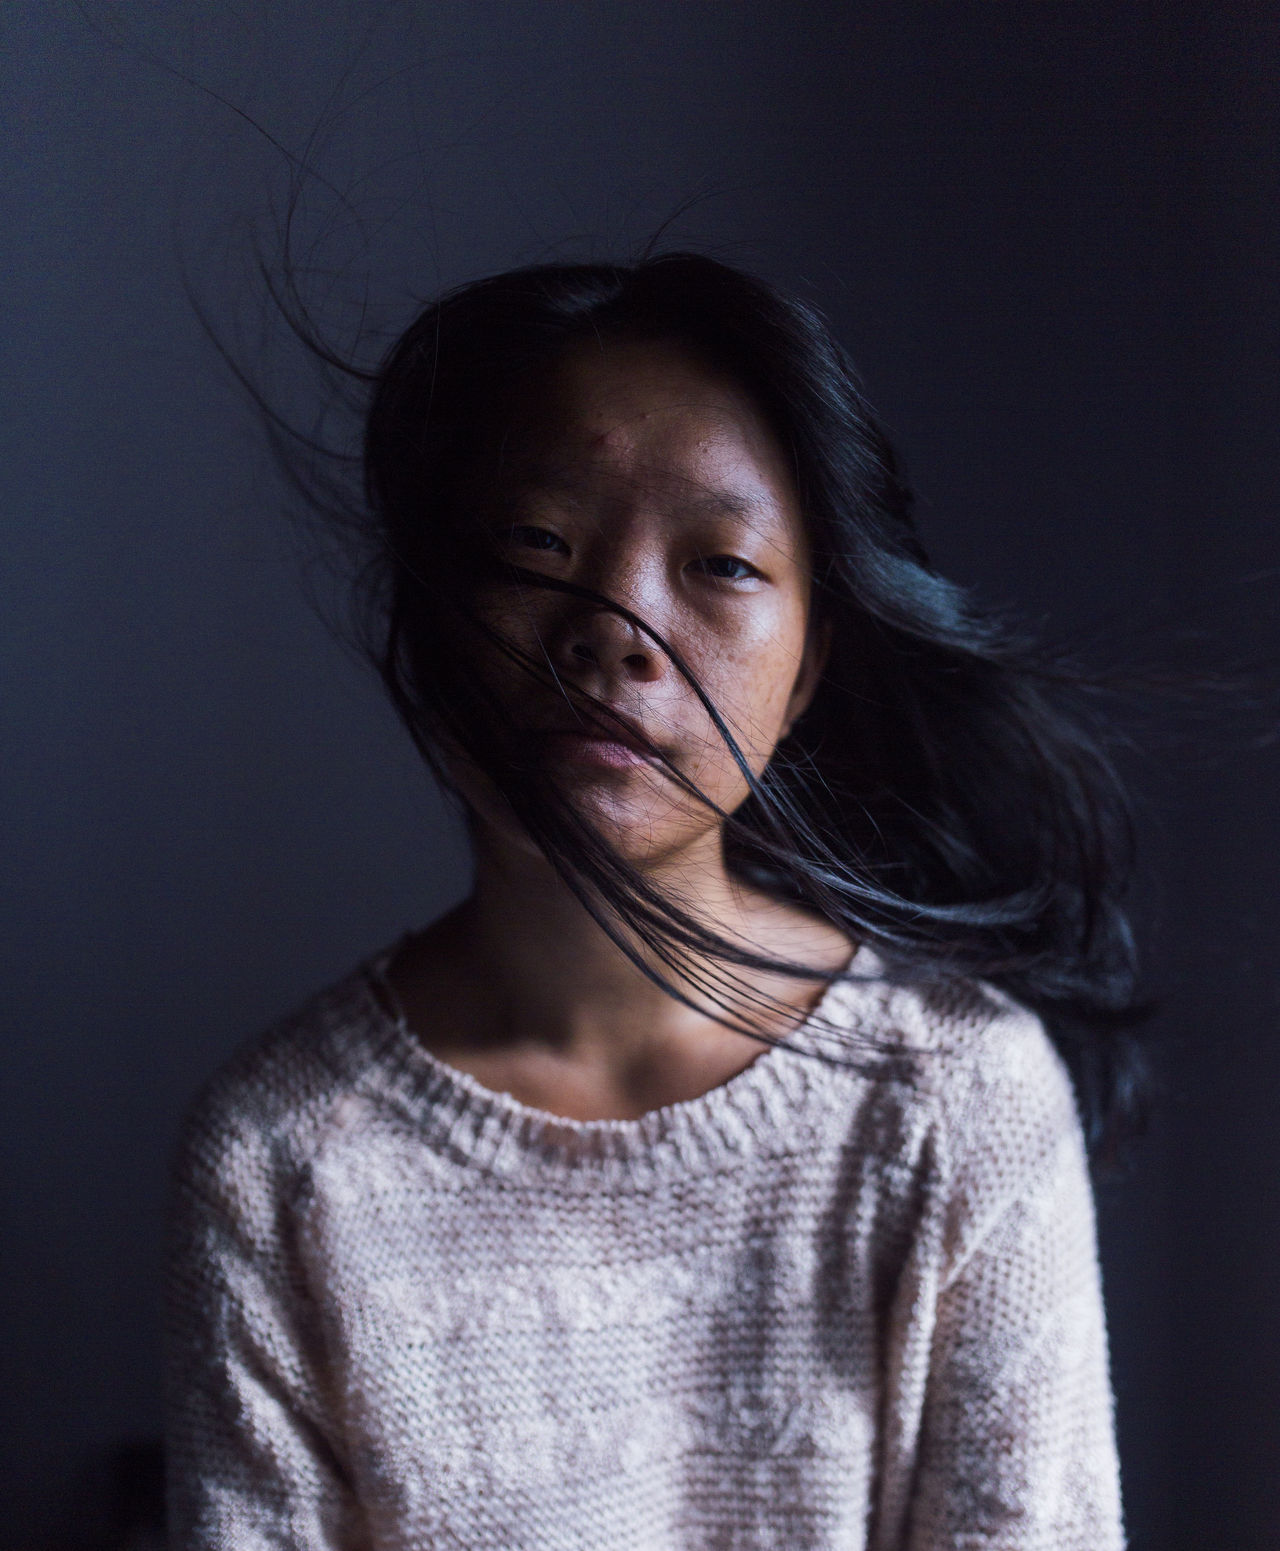 Dreamy EyeEm Best Shots Indoors  Long Hair Portrait Portrait Of A Woman Surrealism The Portraitist - 2017 EyeEm Awards Young Women BYOPaper!